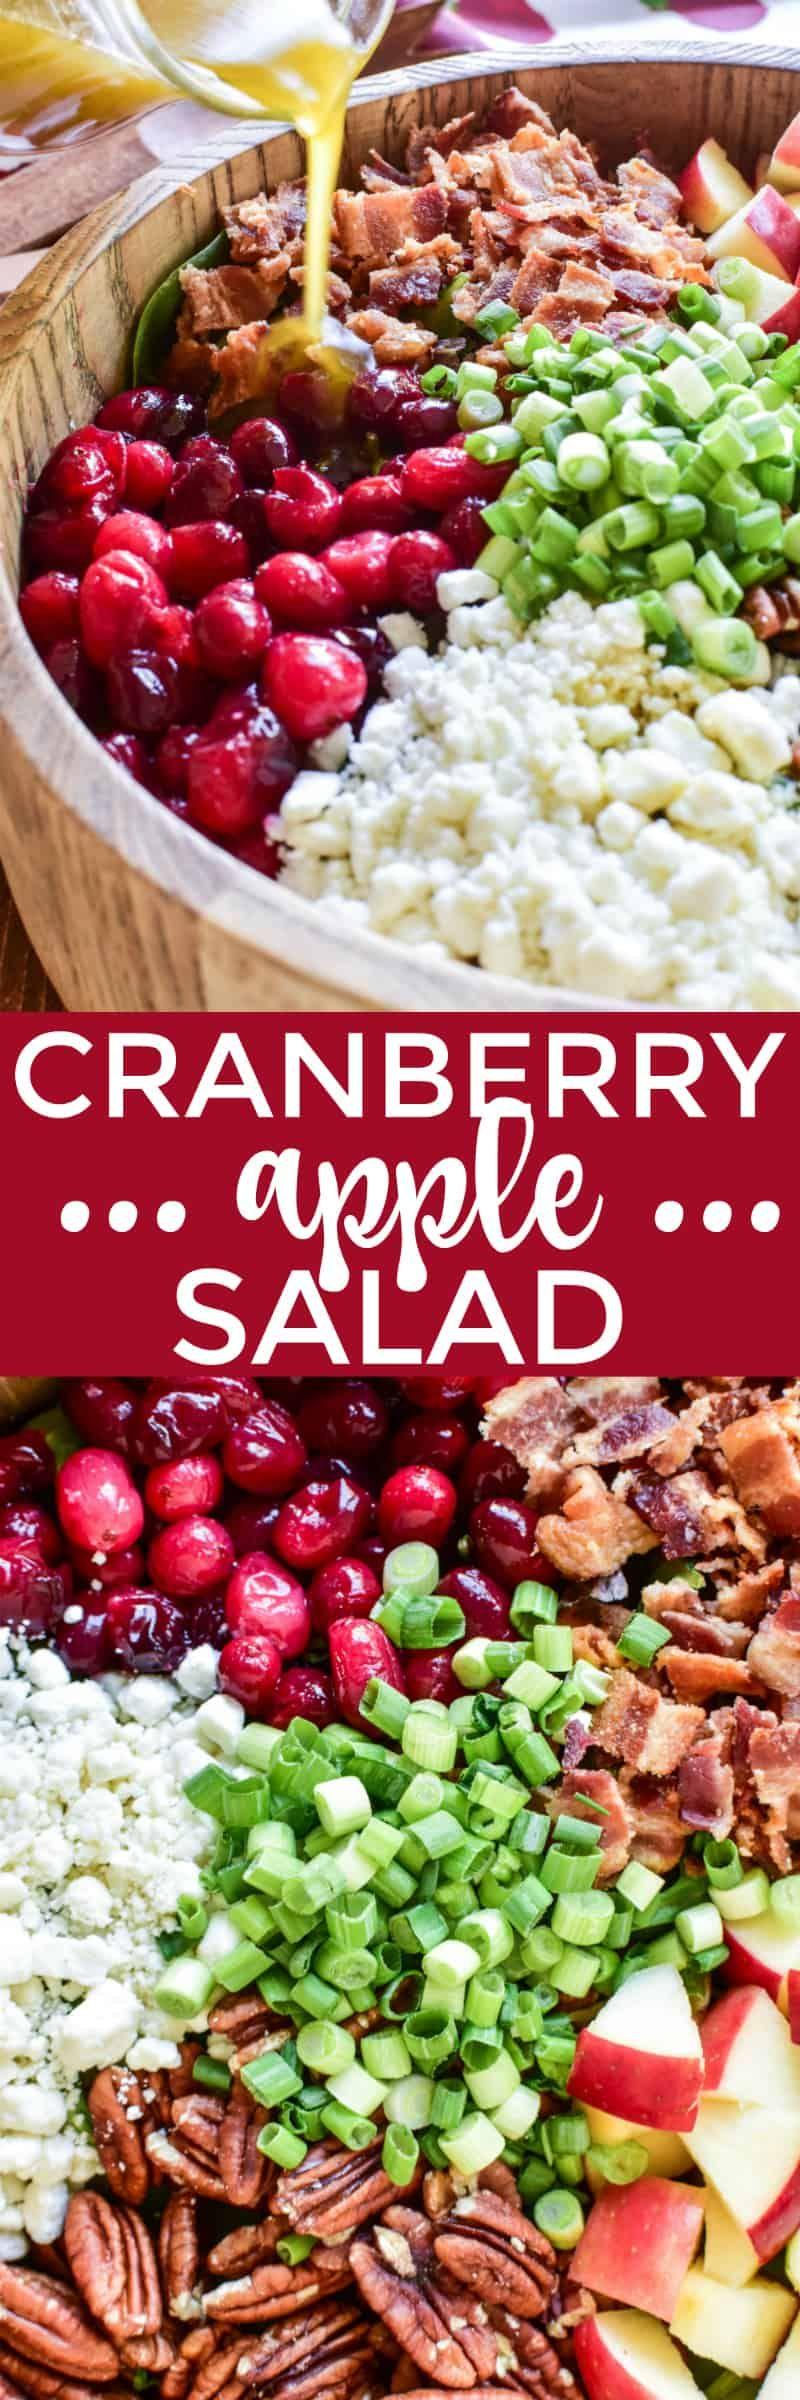 Cranberry Apple Pecan Salad Recipe Pecan Salad Delicious Salads Healthy Recipes